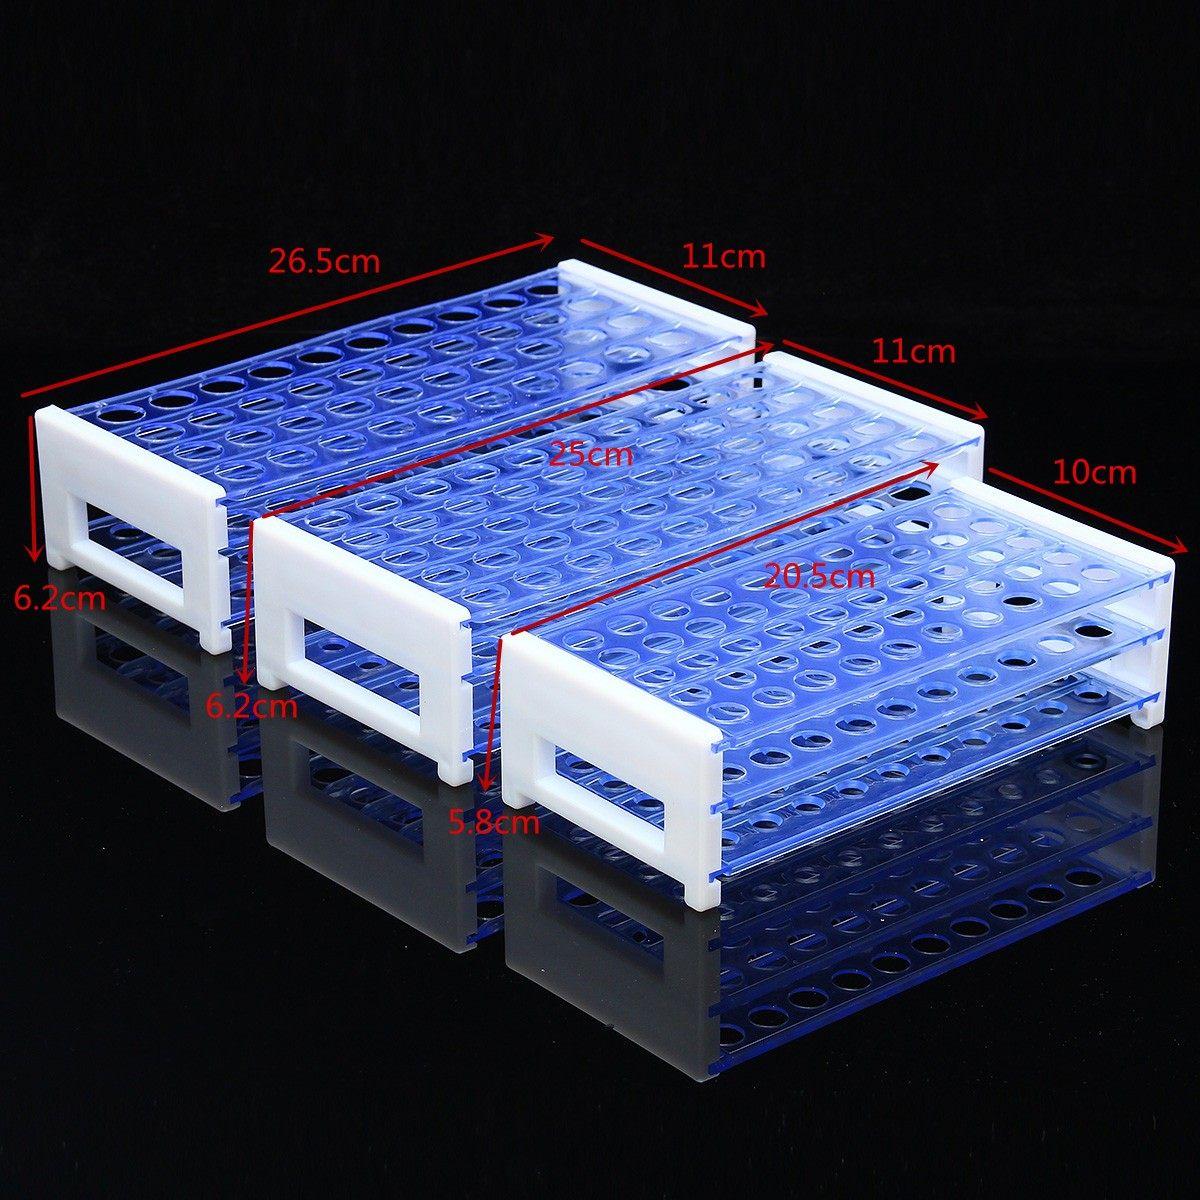 Laboratory Plastic Test Tube Rack Holder Stand For 8-18MM Test Tubing Racks Shelf For Centrifuge Tubes 40 Or 50 Holes Positions